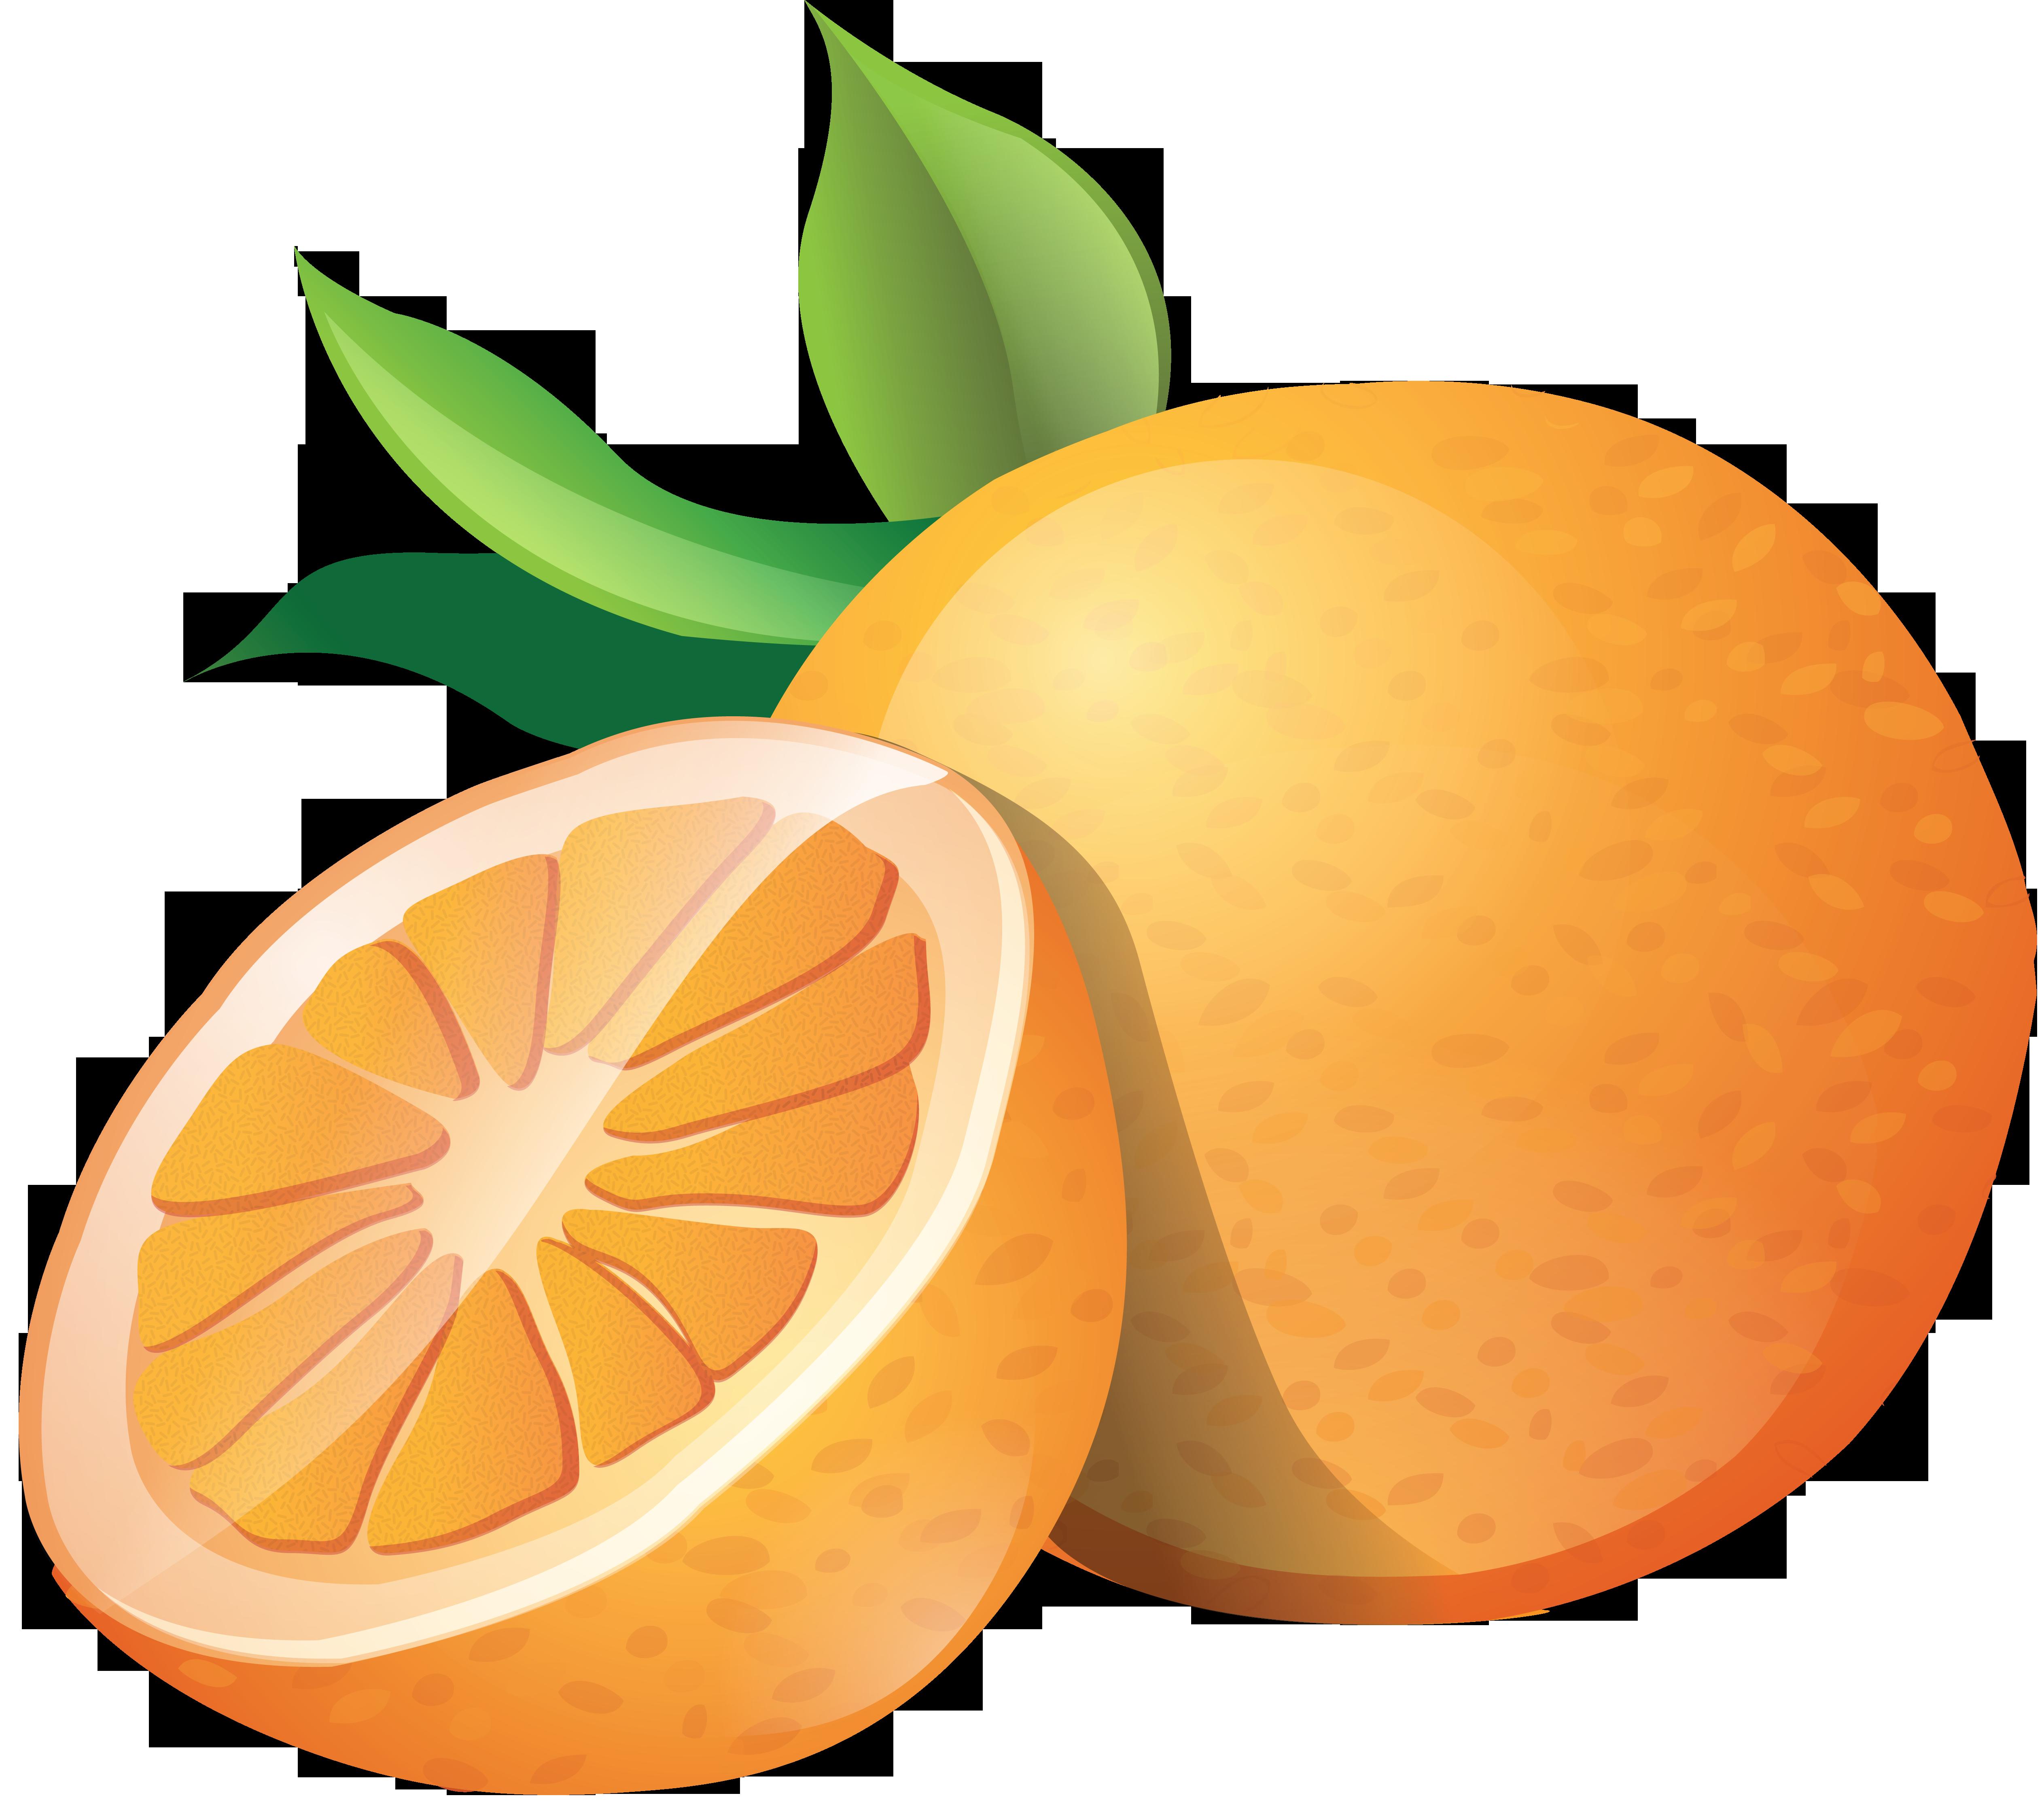 Oranges png image purepng. Orange clipart orange fruit